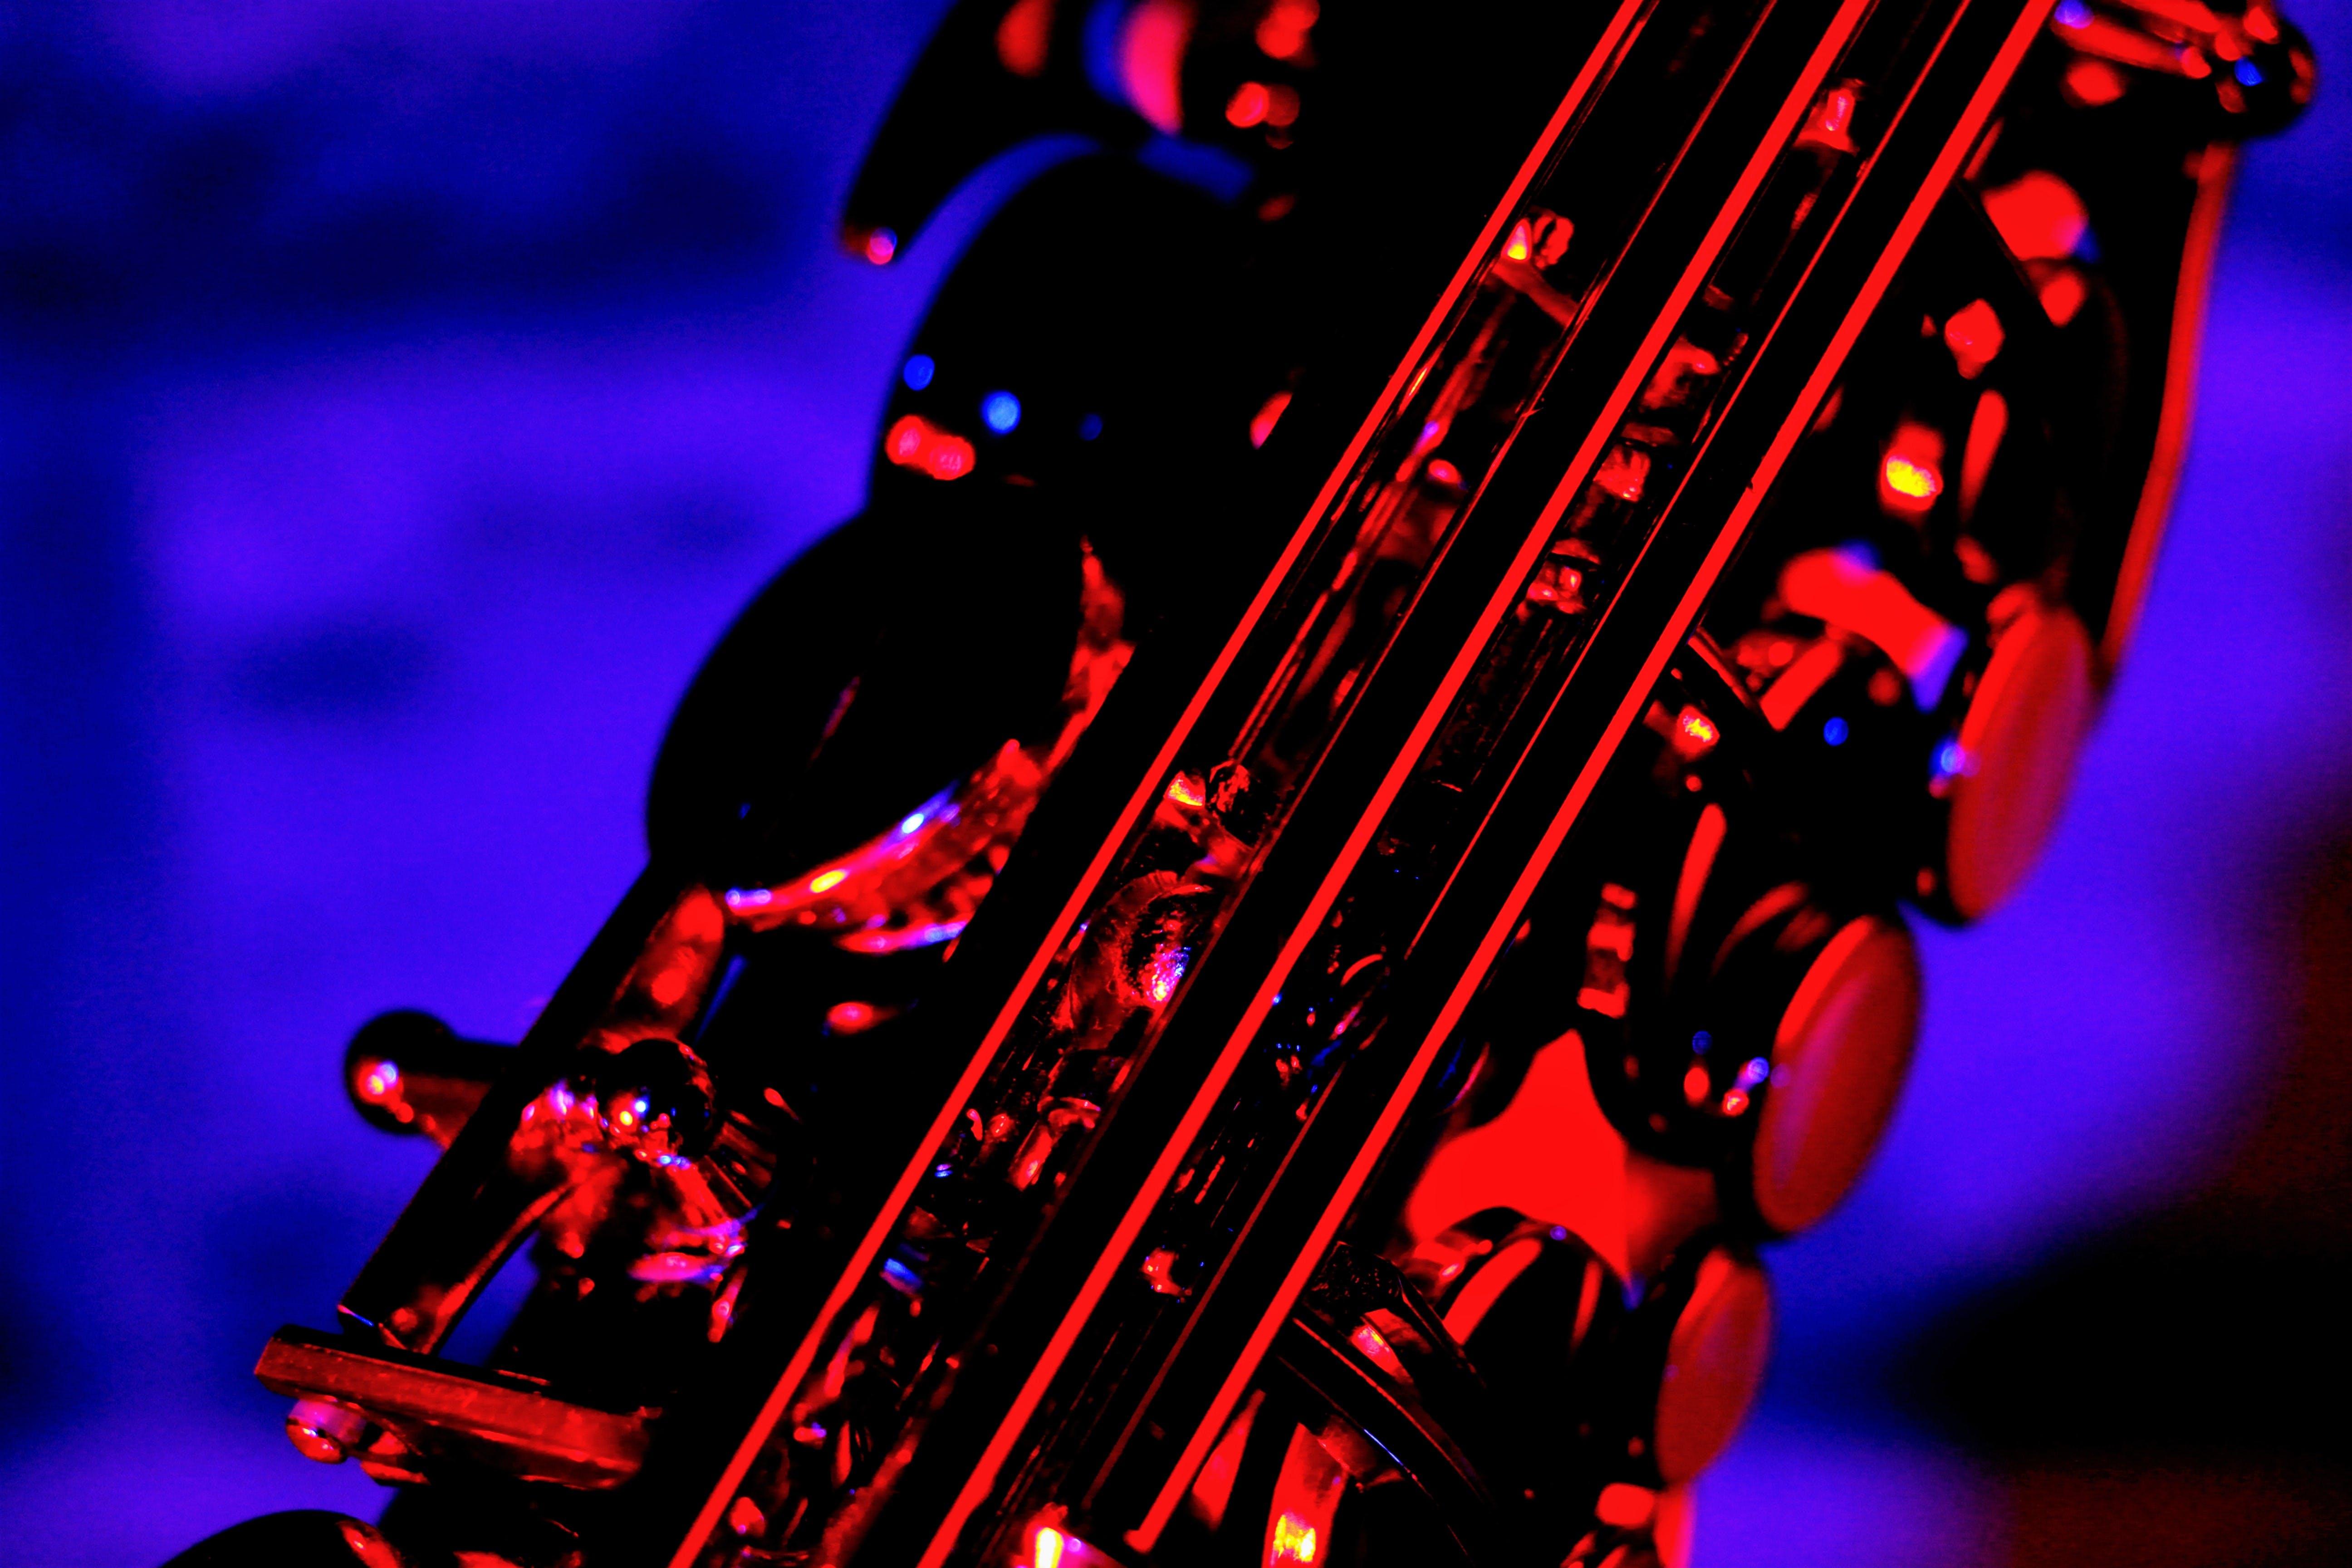 Kostenloses Stock Foto zu blau, rot, saxophon, wallpaper